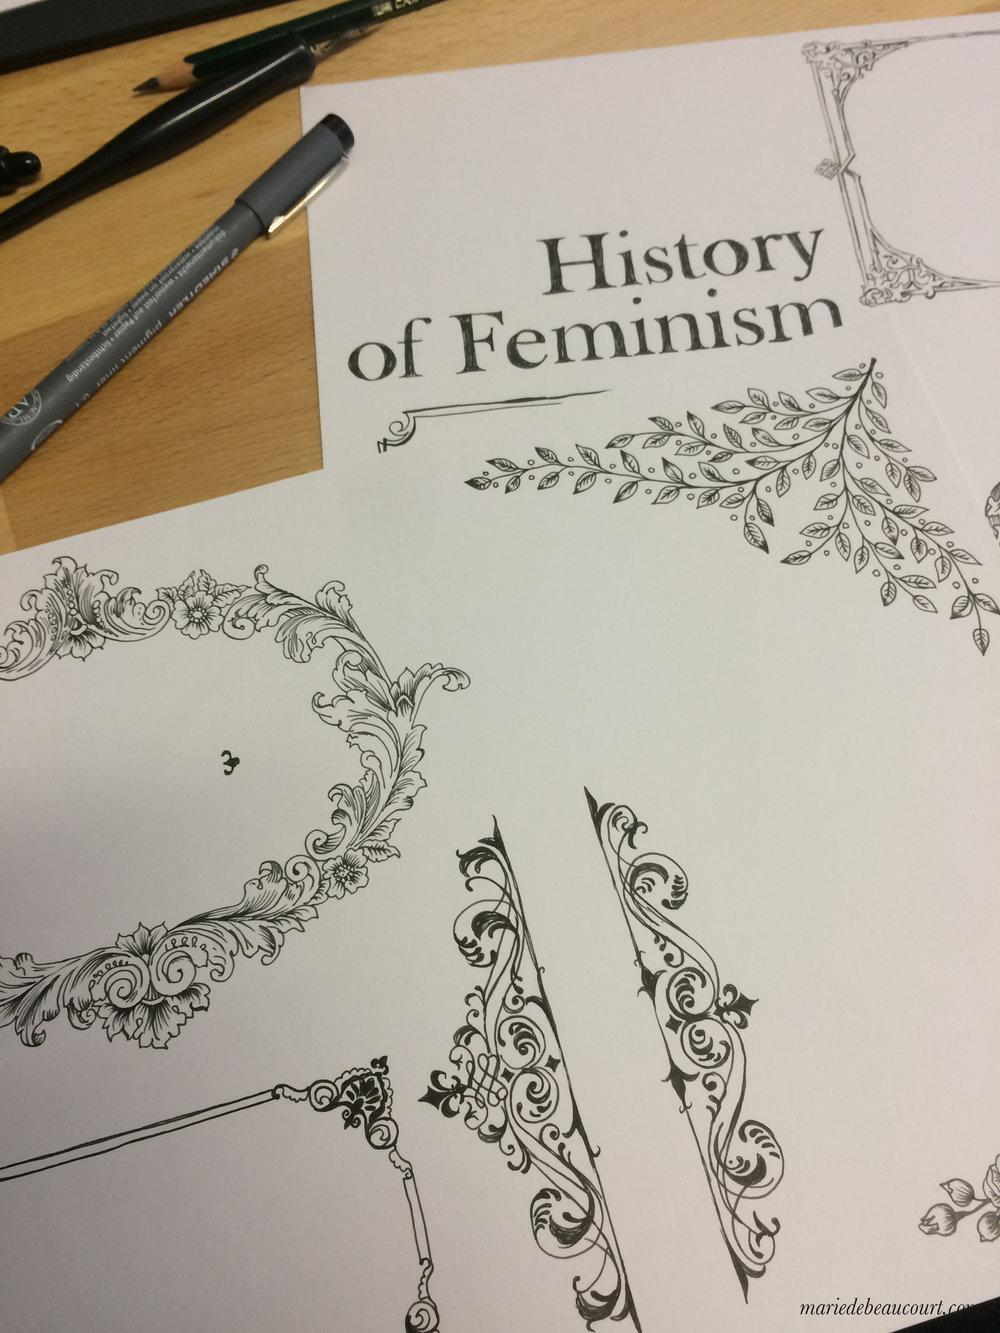 Herstory of Feminism